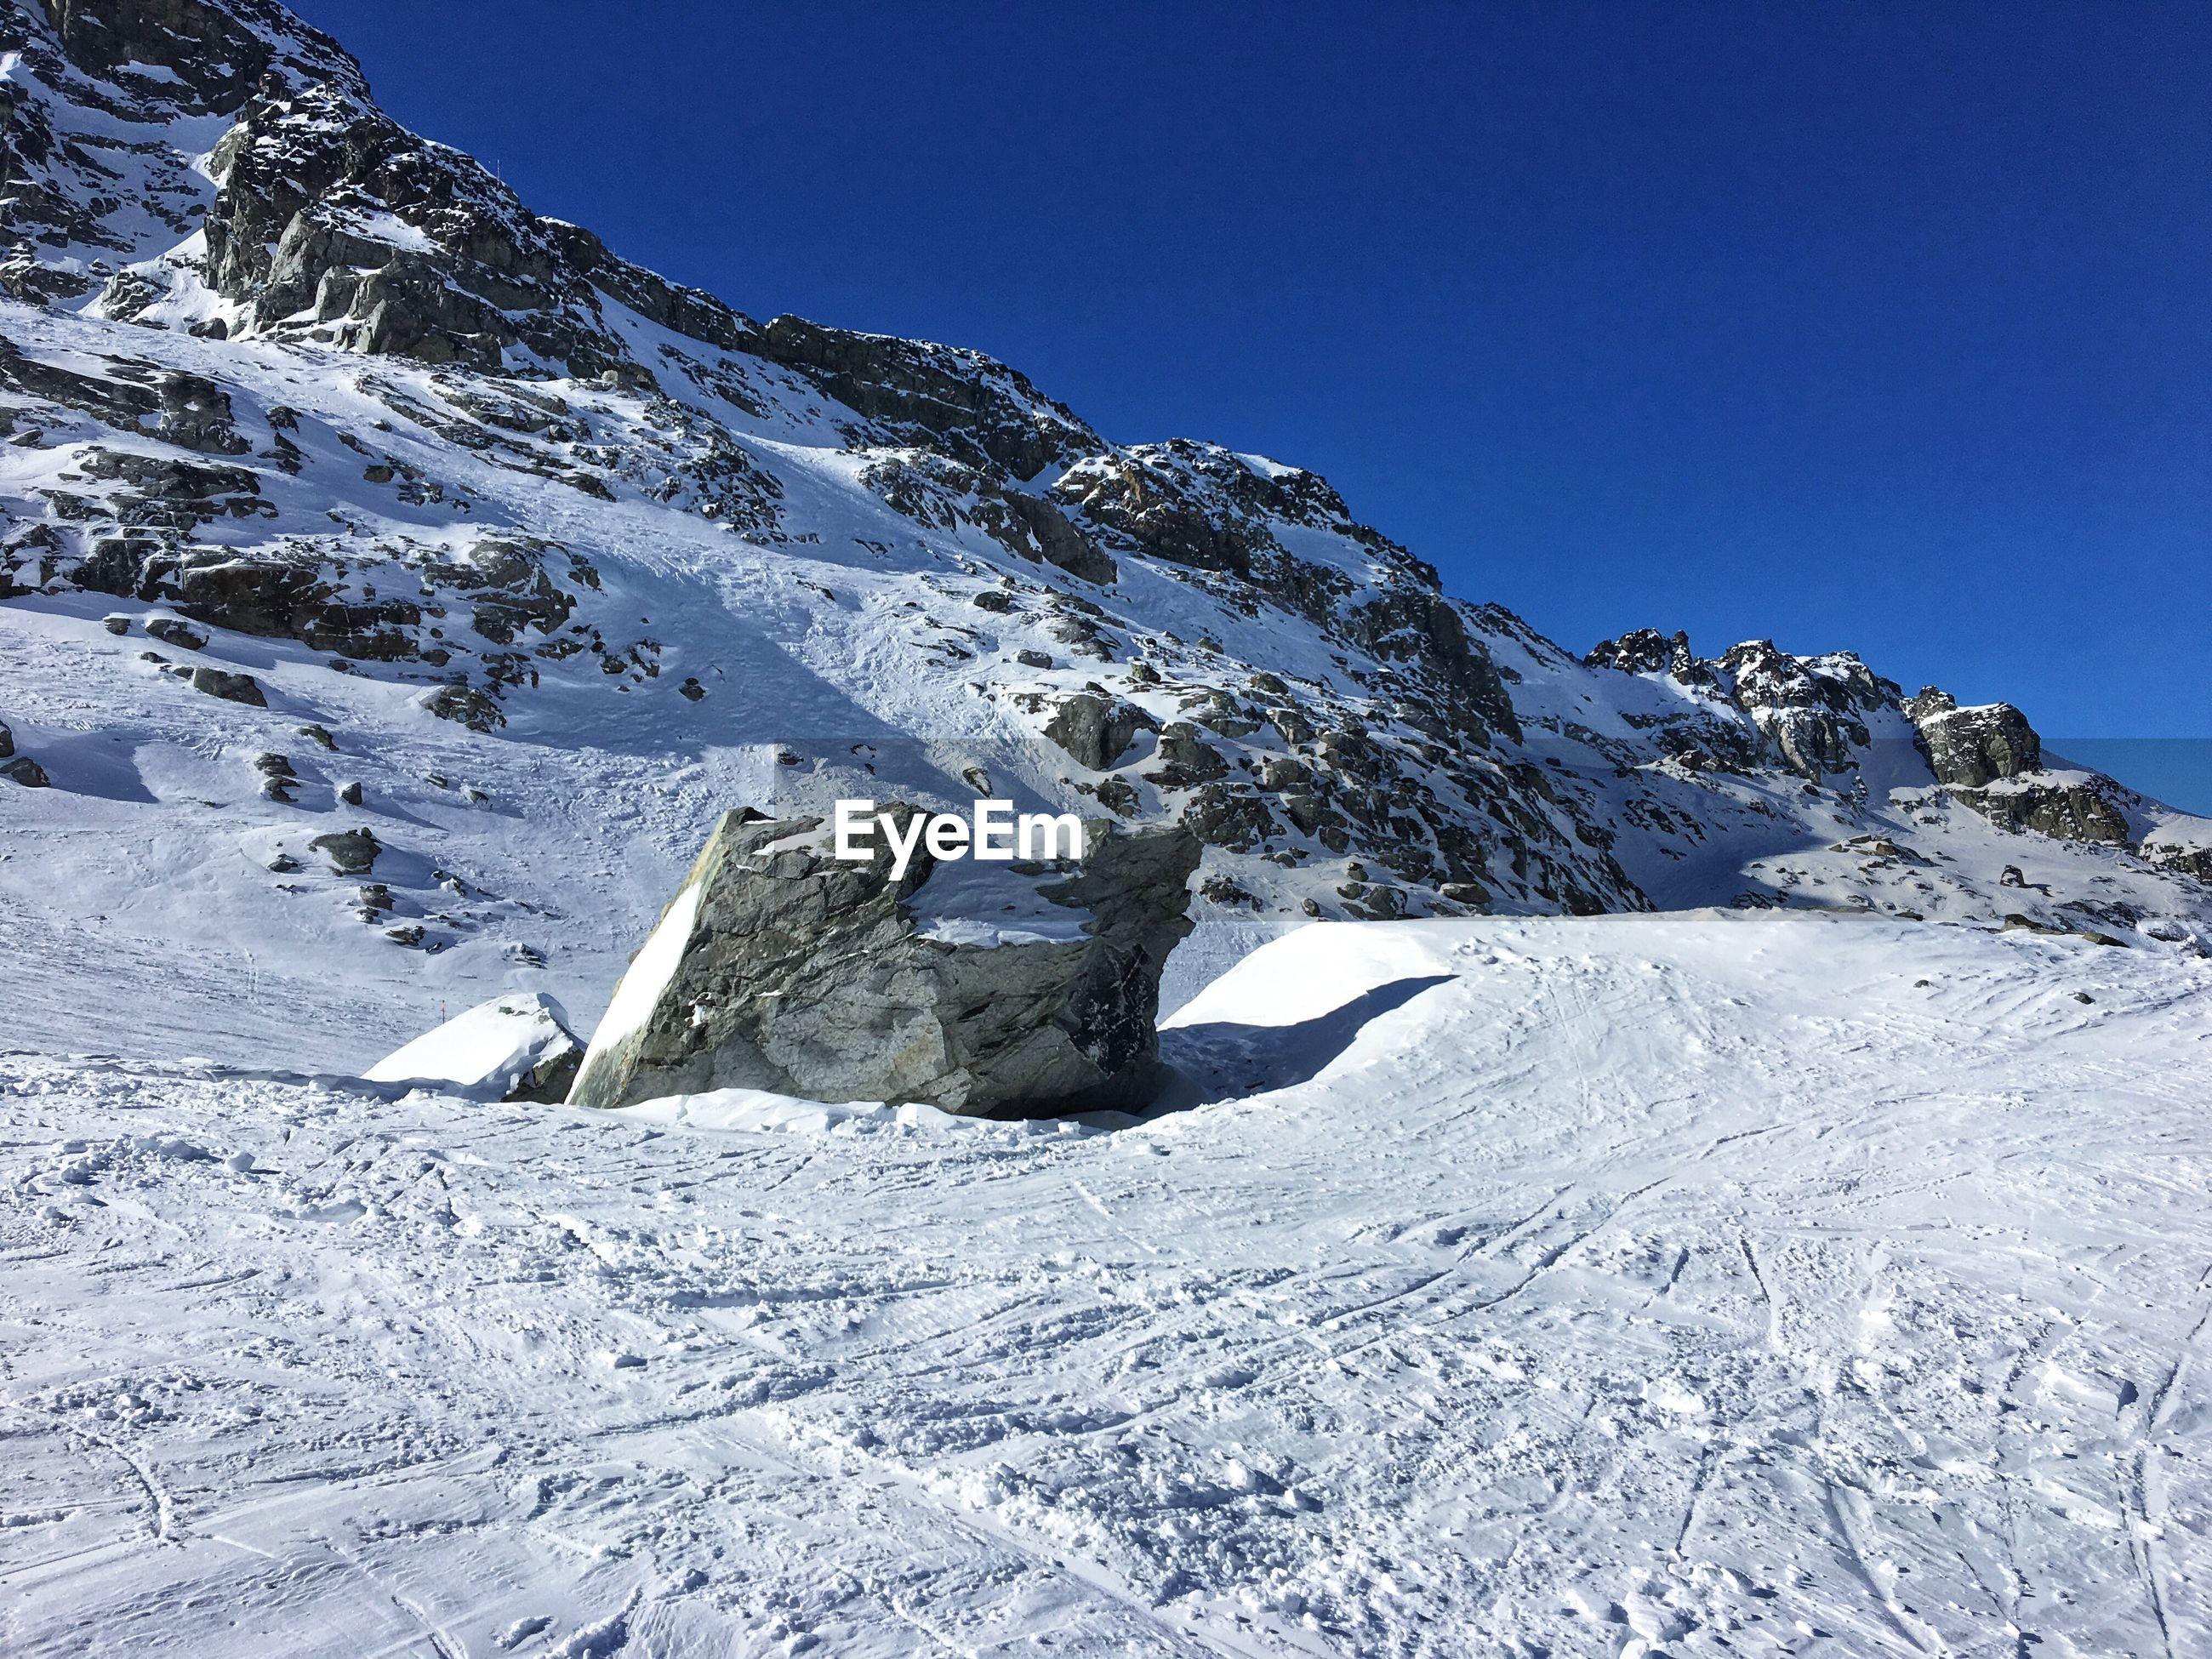 SNOWCAPPED MOUNTAIN AGAINST CLEAR BLUE SKY